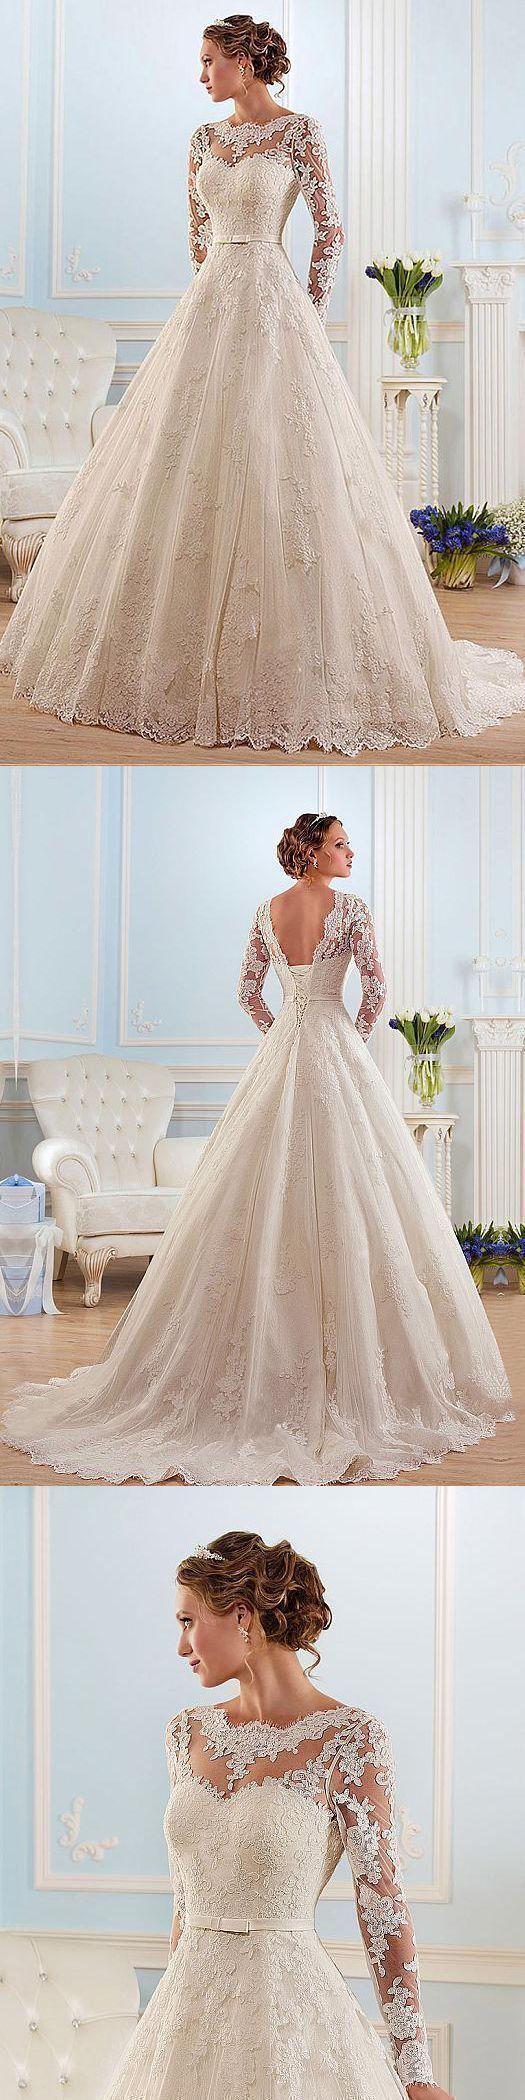 best wedding dreams images on pinterest bead crochet